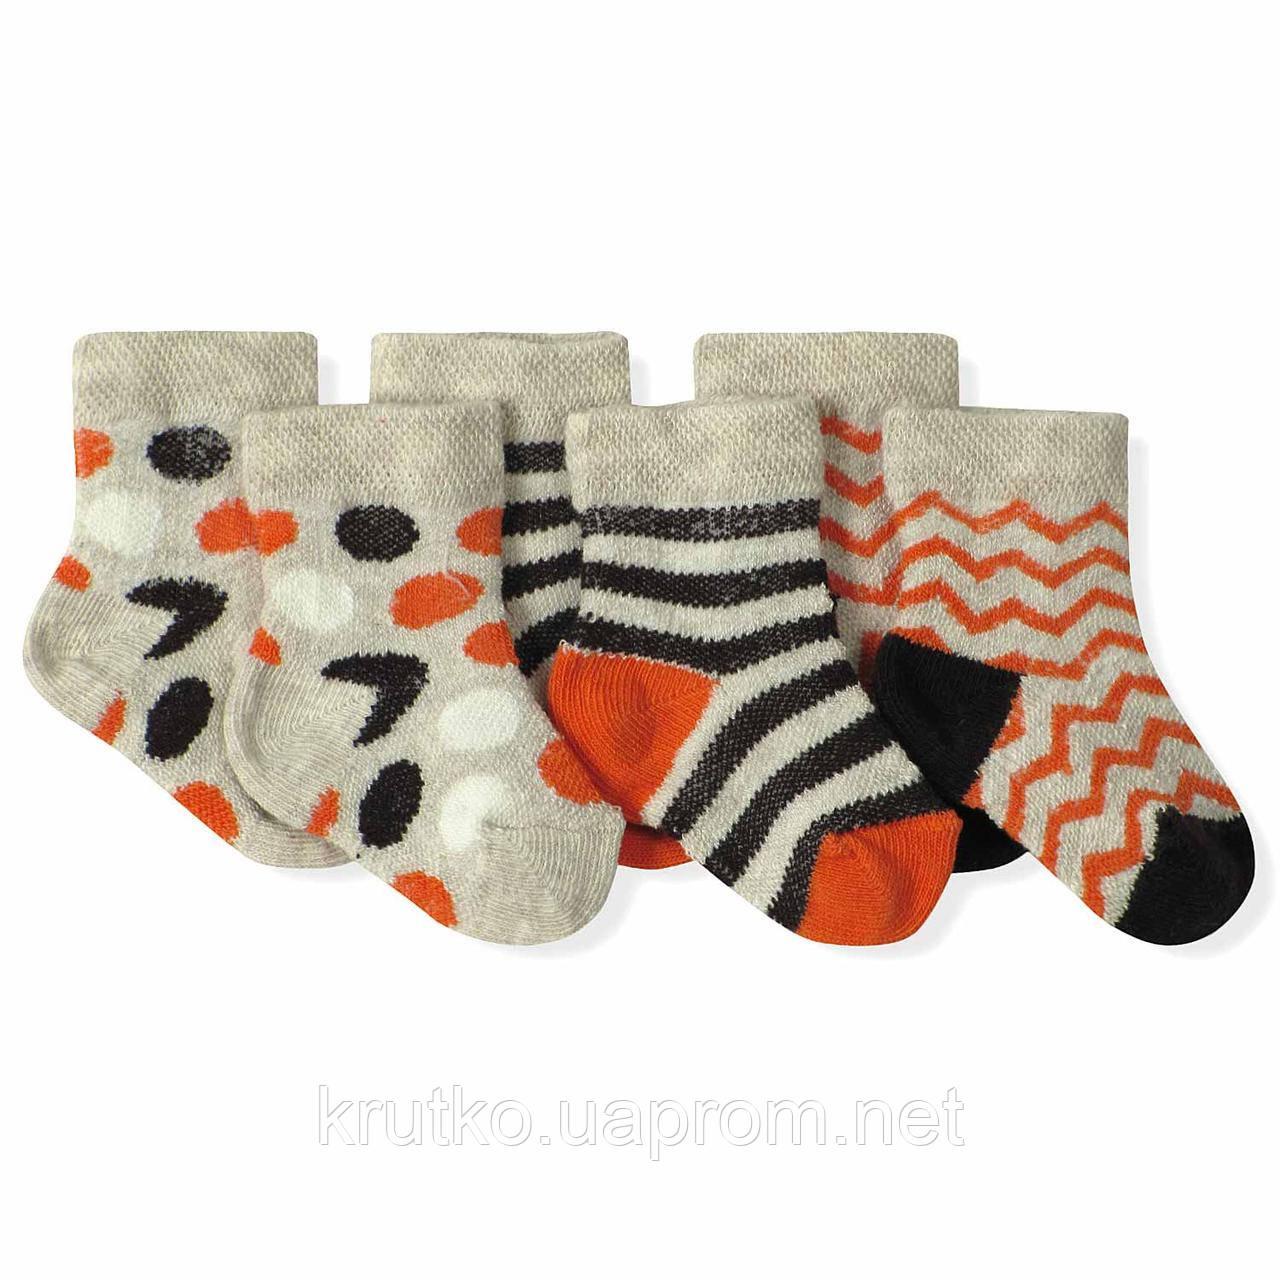 Носки Caramell (3 пары) Caramell